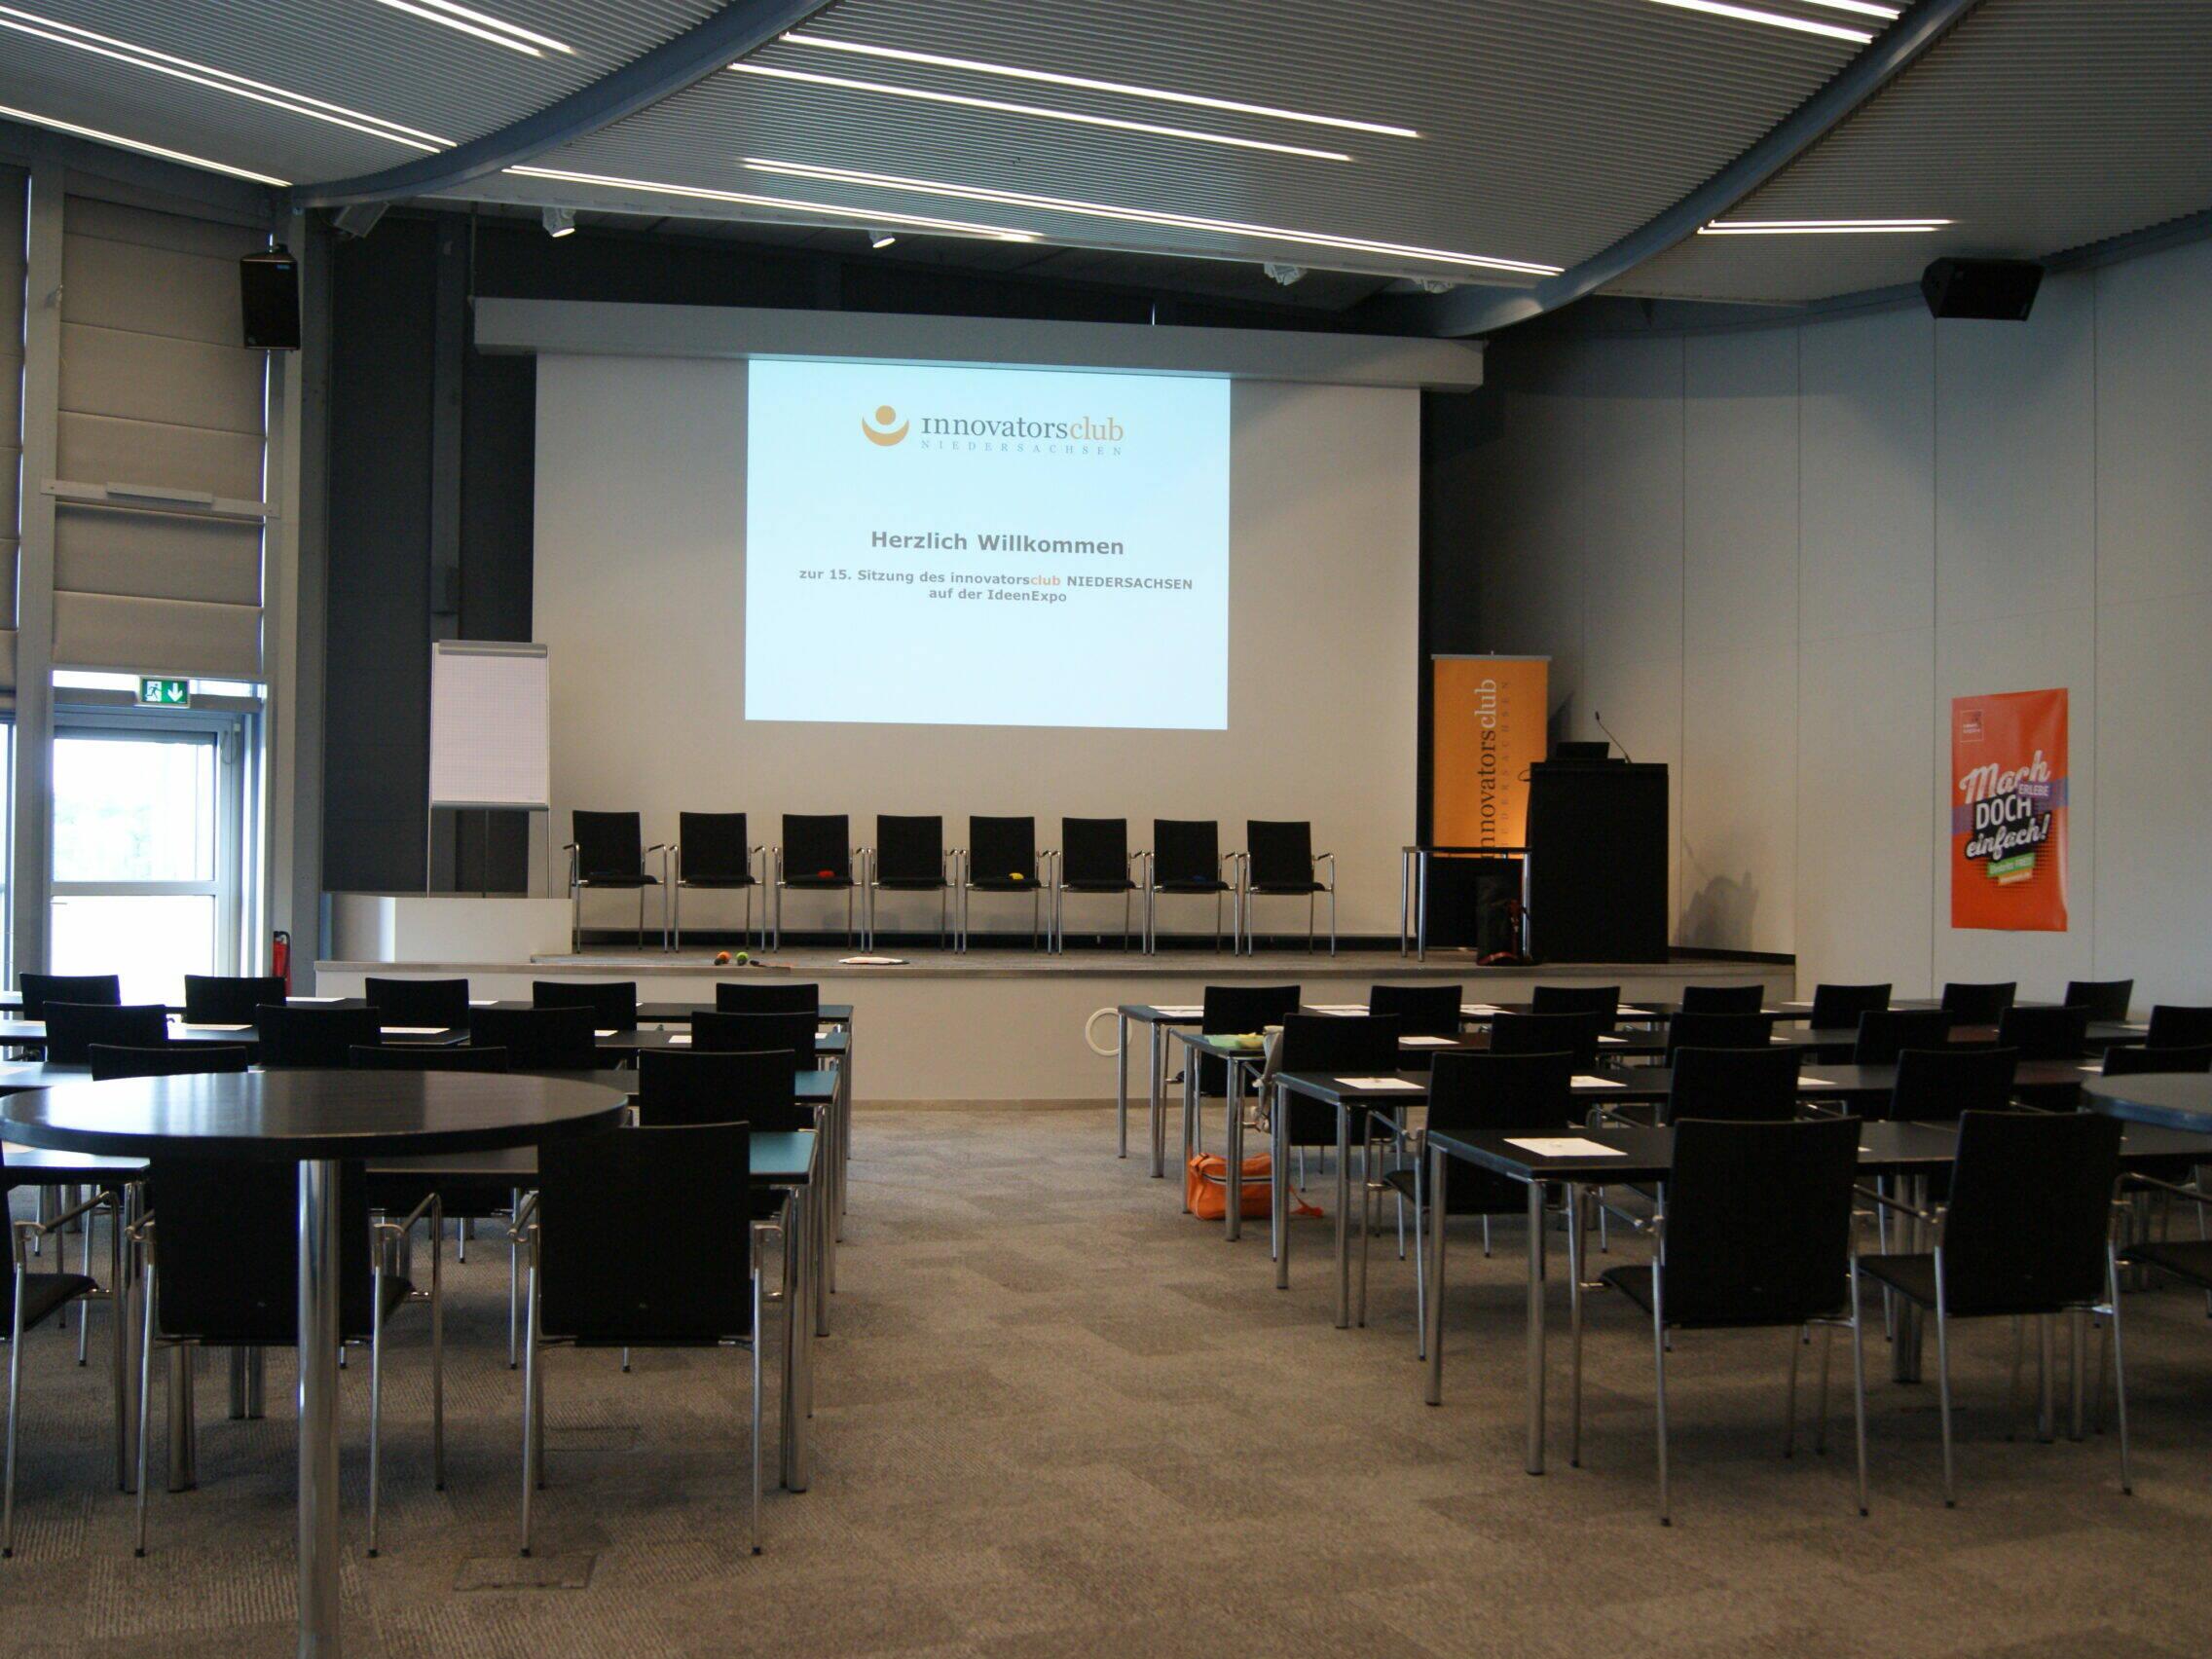 Veranstaltung innovatorsclub - leerer Tagungsraum